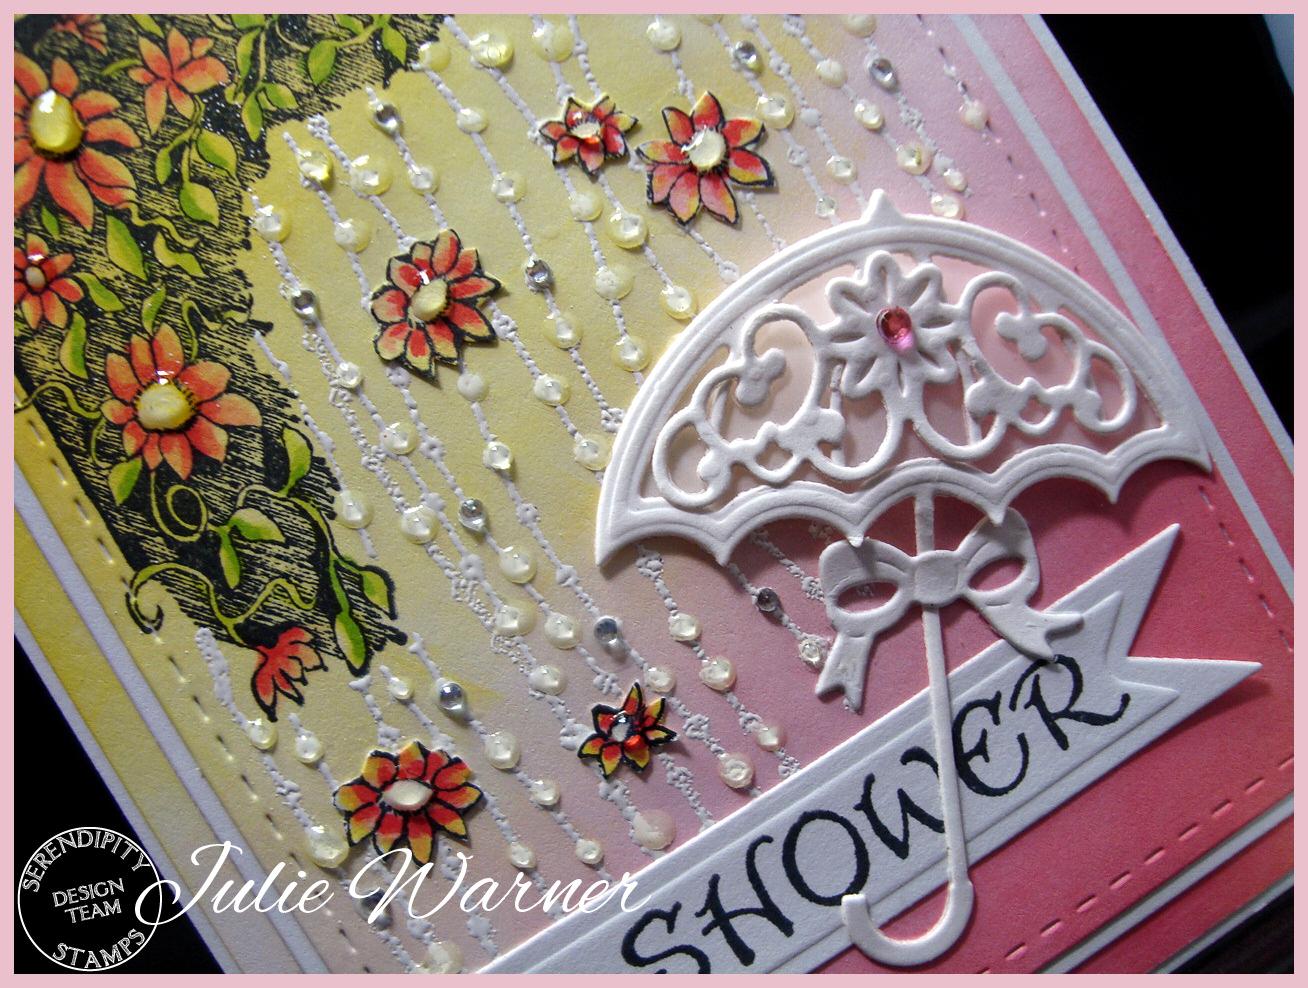 Shower cu 05916